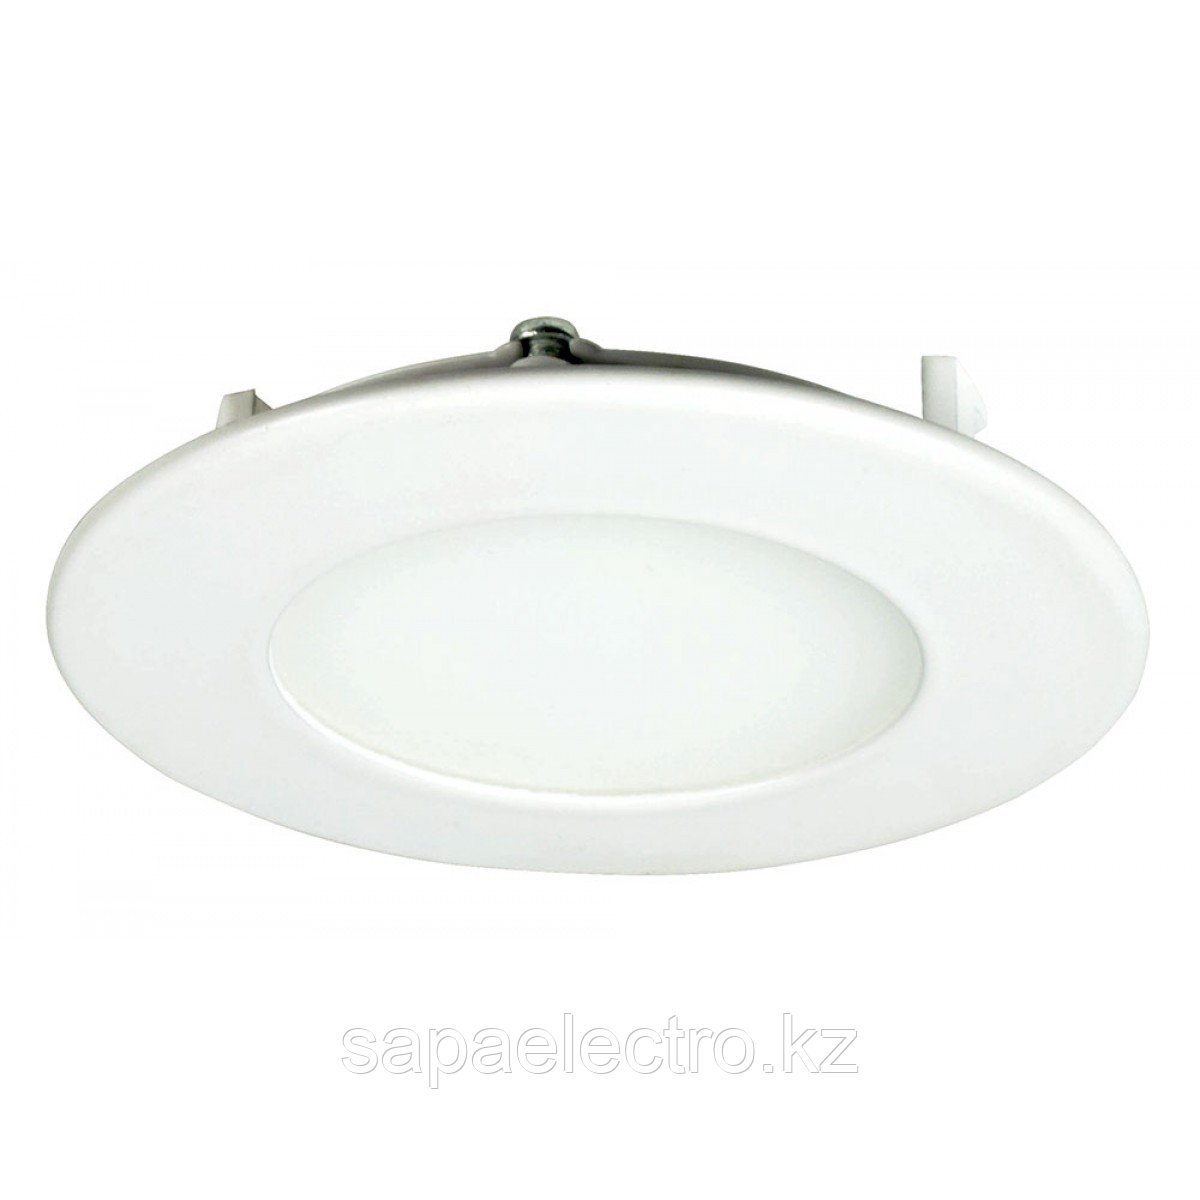 Свет-к DL LED ROUND PANEL 3W 3000K (TS) 100шт